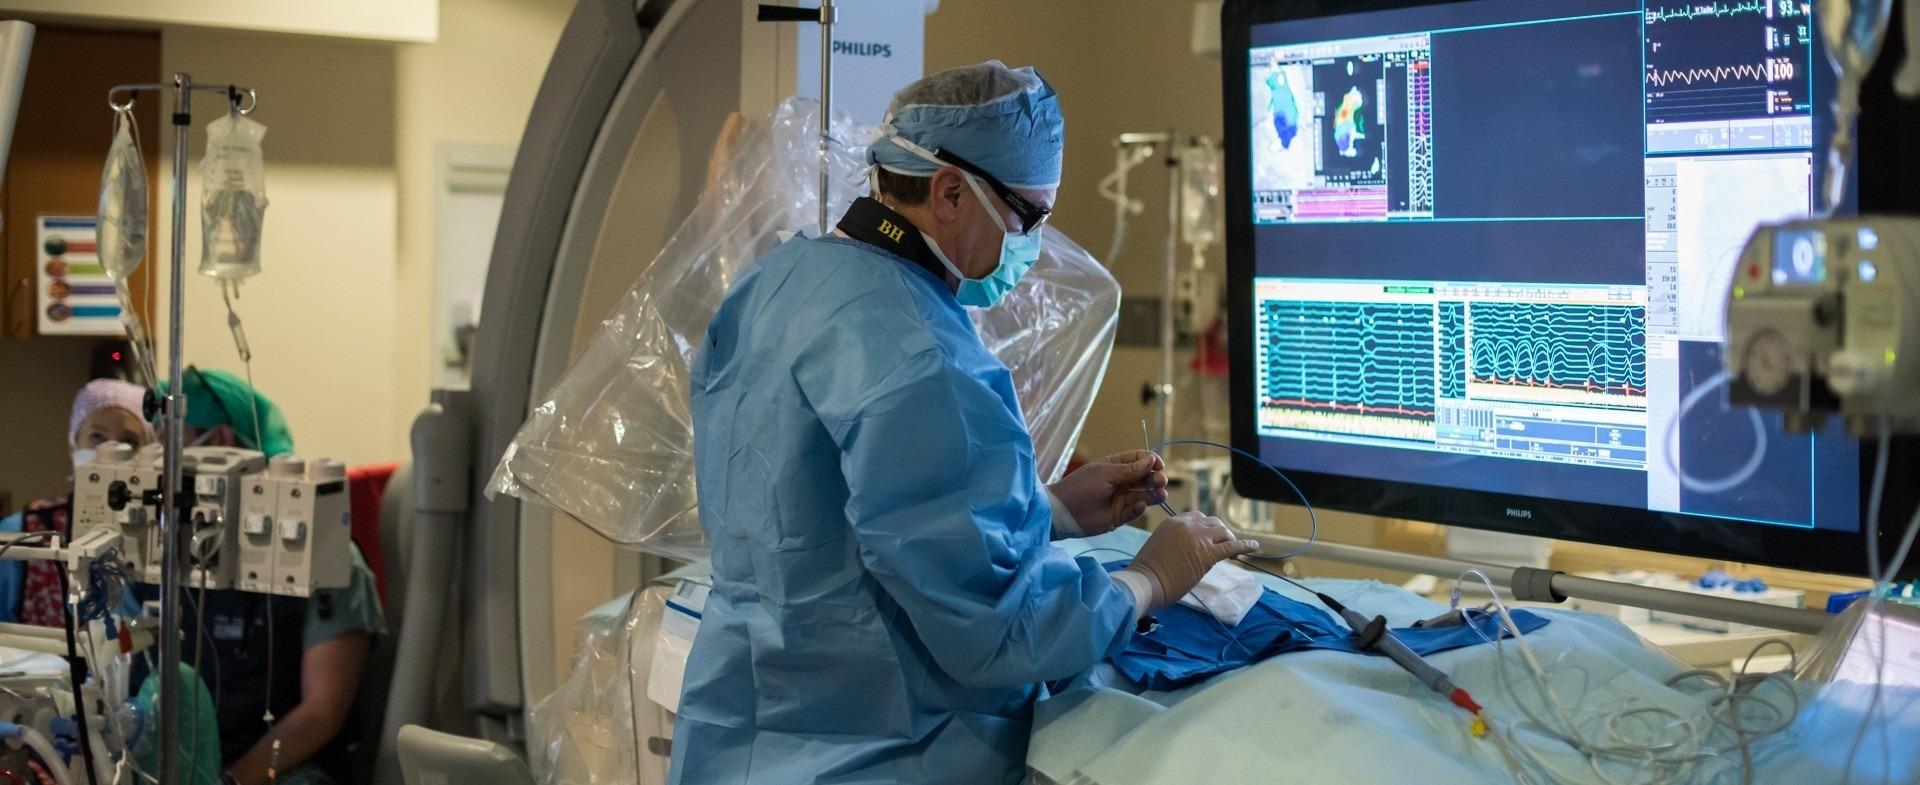 Surgeon performing atrial fibrillation (AFib) procedure